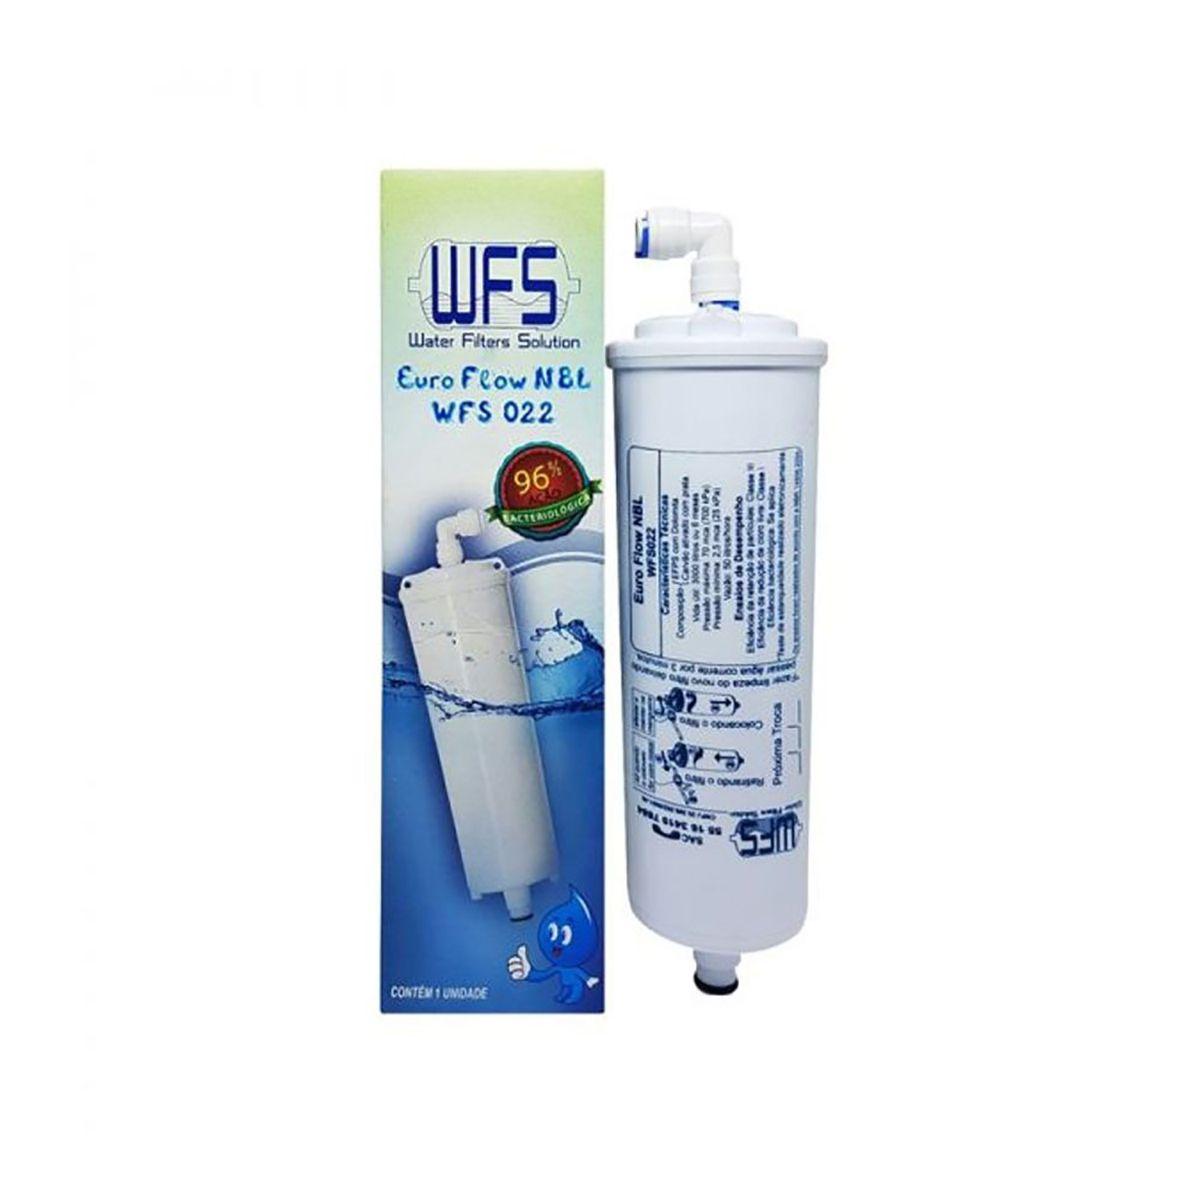 Refil WFS 022 Euro Flow NBL- Compatível com Europa Noblesse